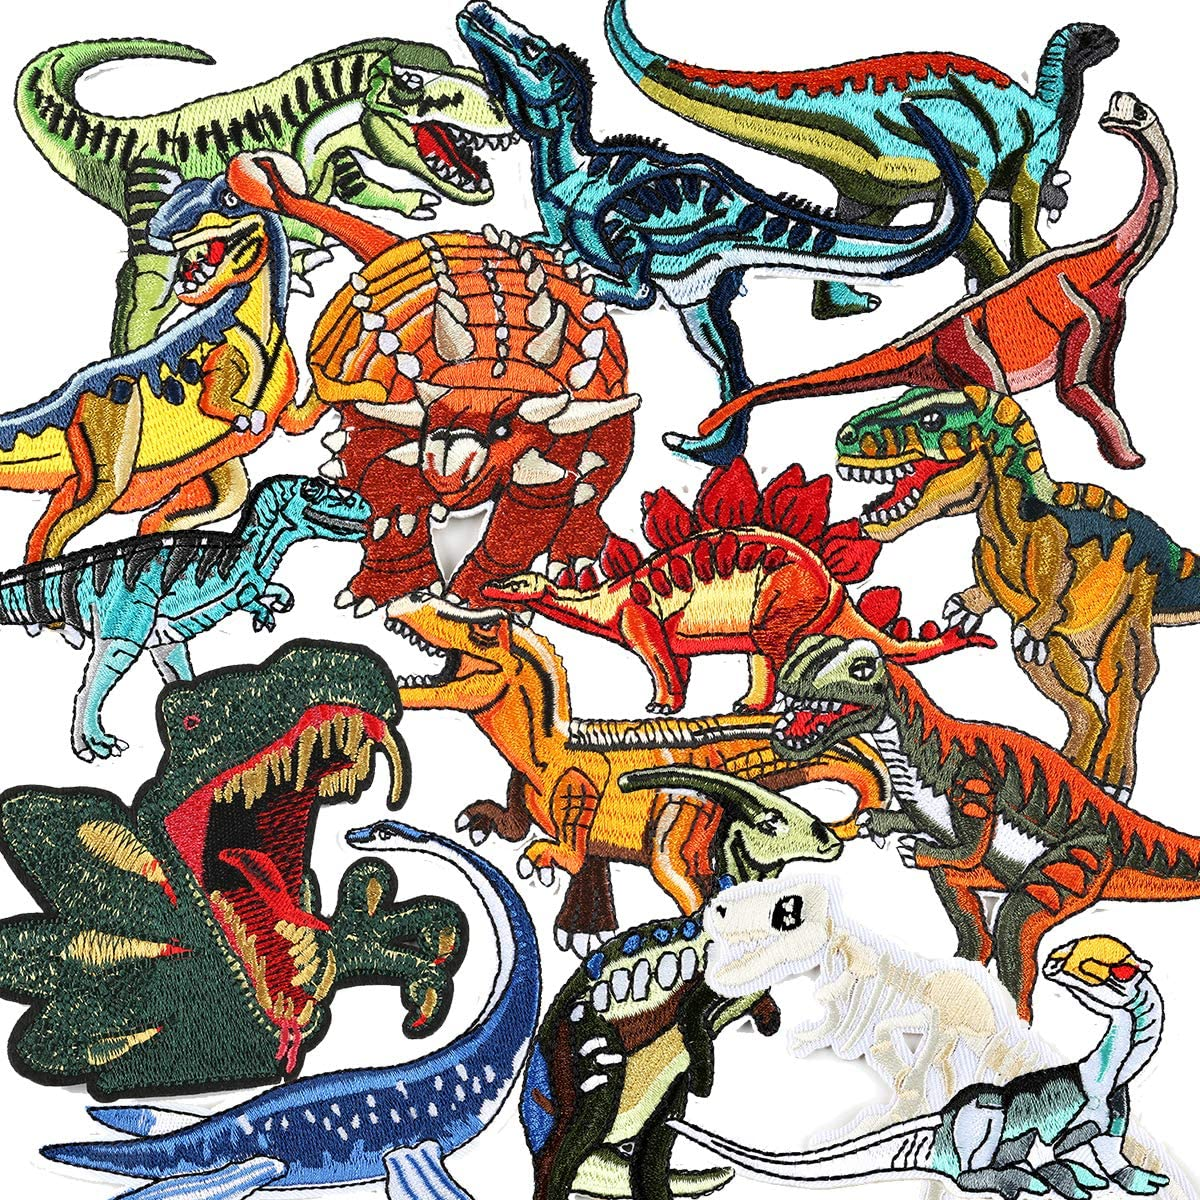 LAKIND Parches Dinosaurios 16-PACK Parches De Dinosaurios Parches Ropa Termoadhesivos Bricolaje Hierro-en Parches de Ropa para T-shirt Jeans Ropa Bolsas (16-pack): Amazon.es: Hogar